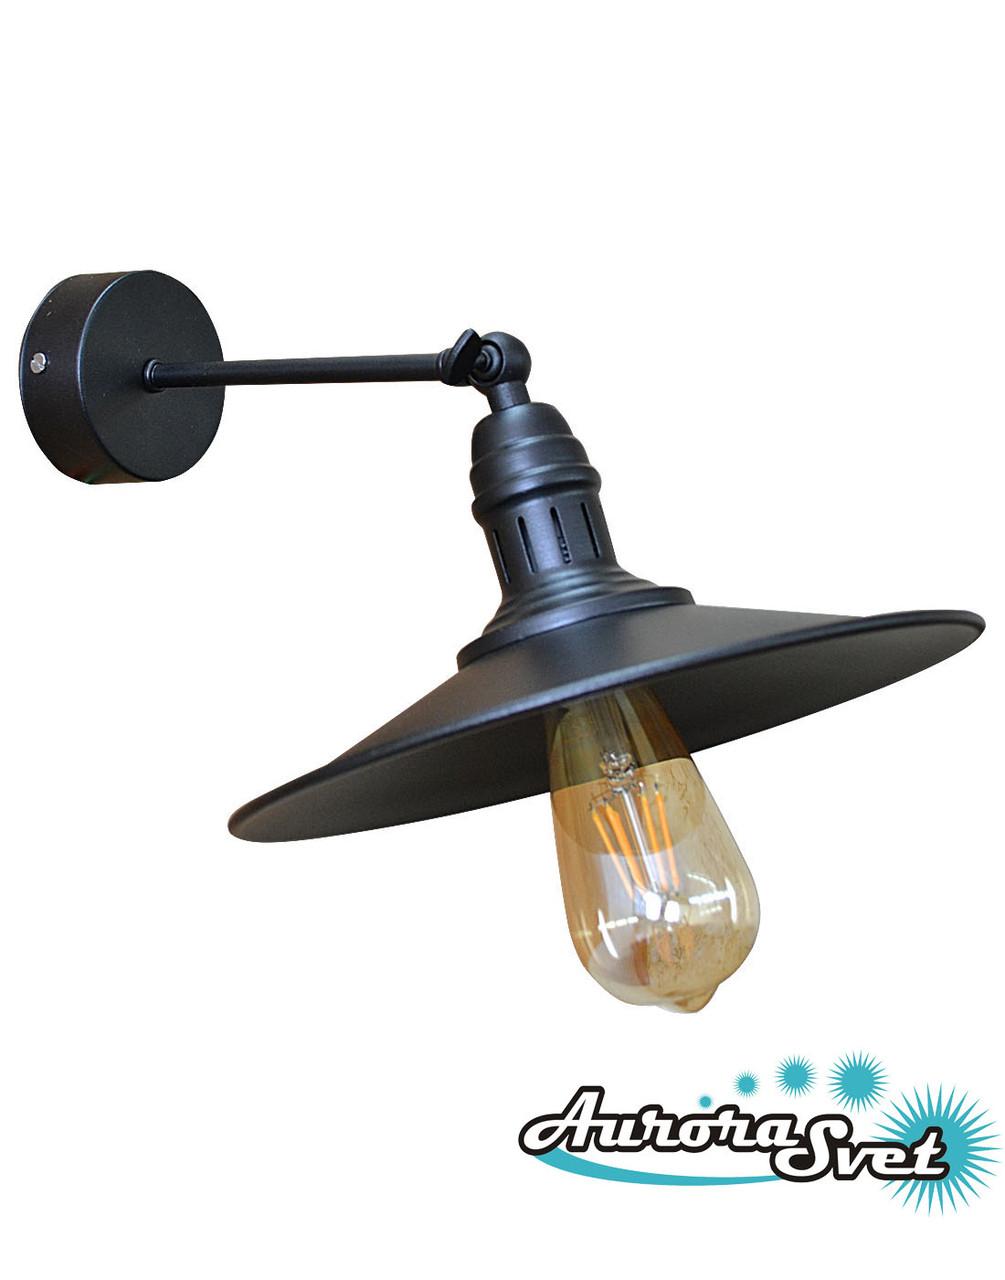 Бра настенная AuroraSvet loft 9500 чёрная.LED светильник бра. Светодиодный светильник бра.